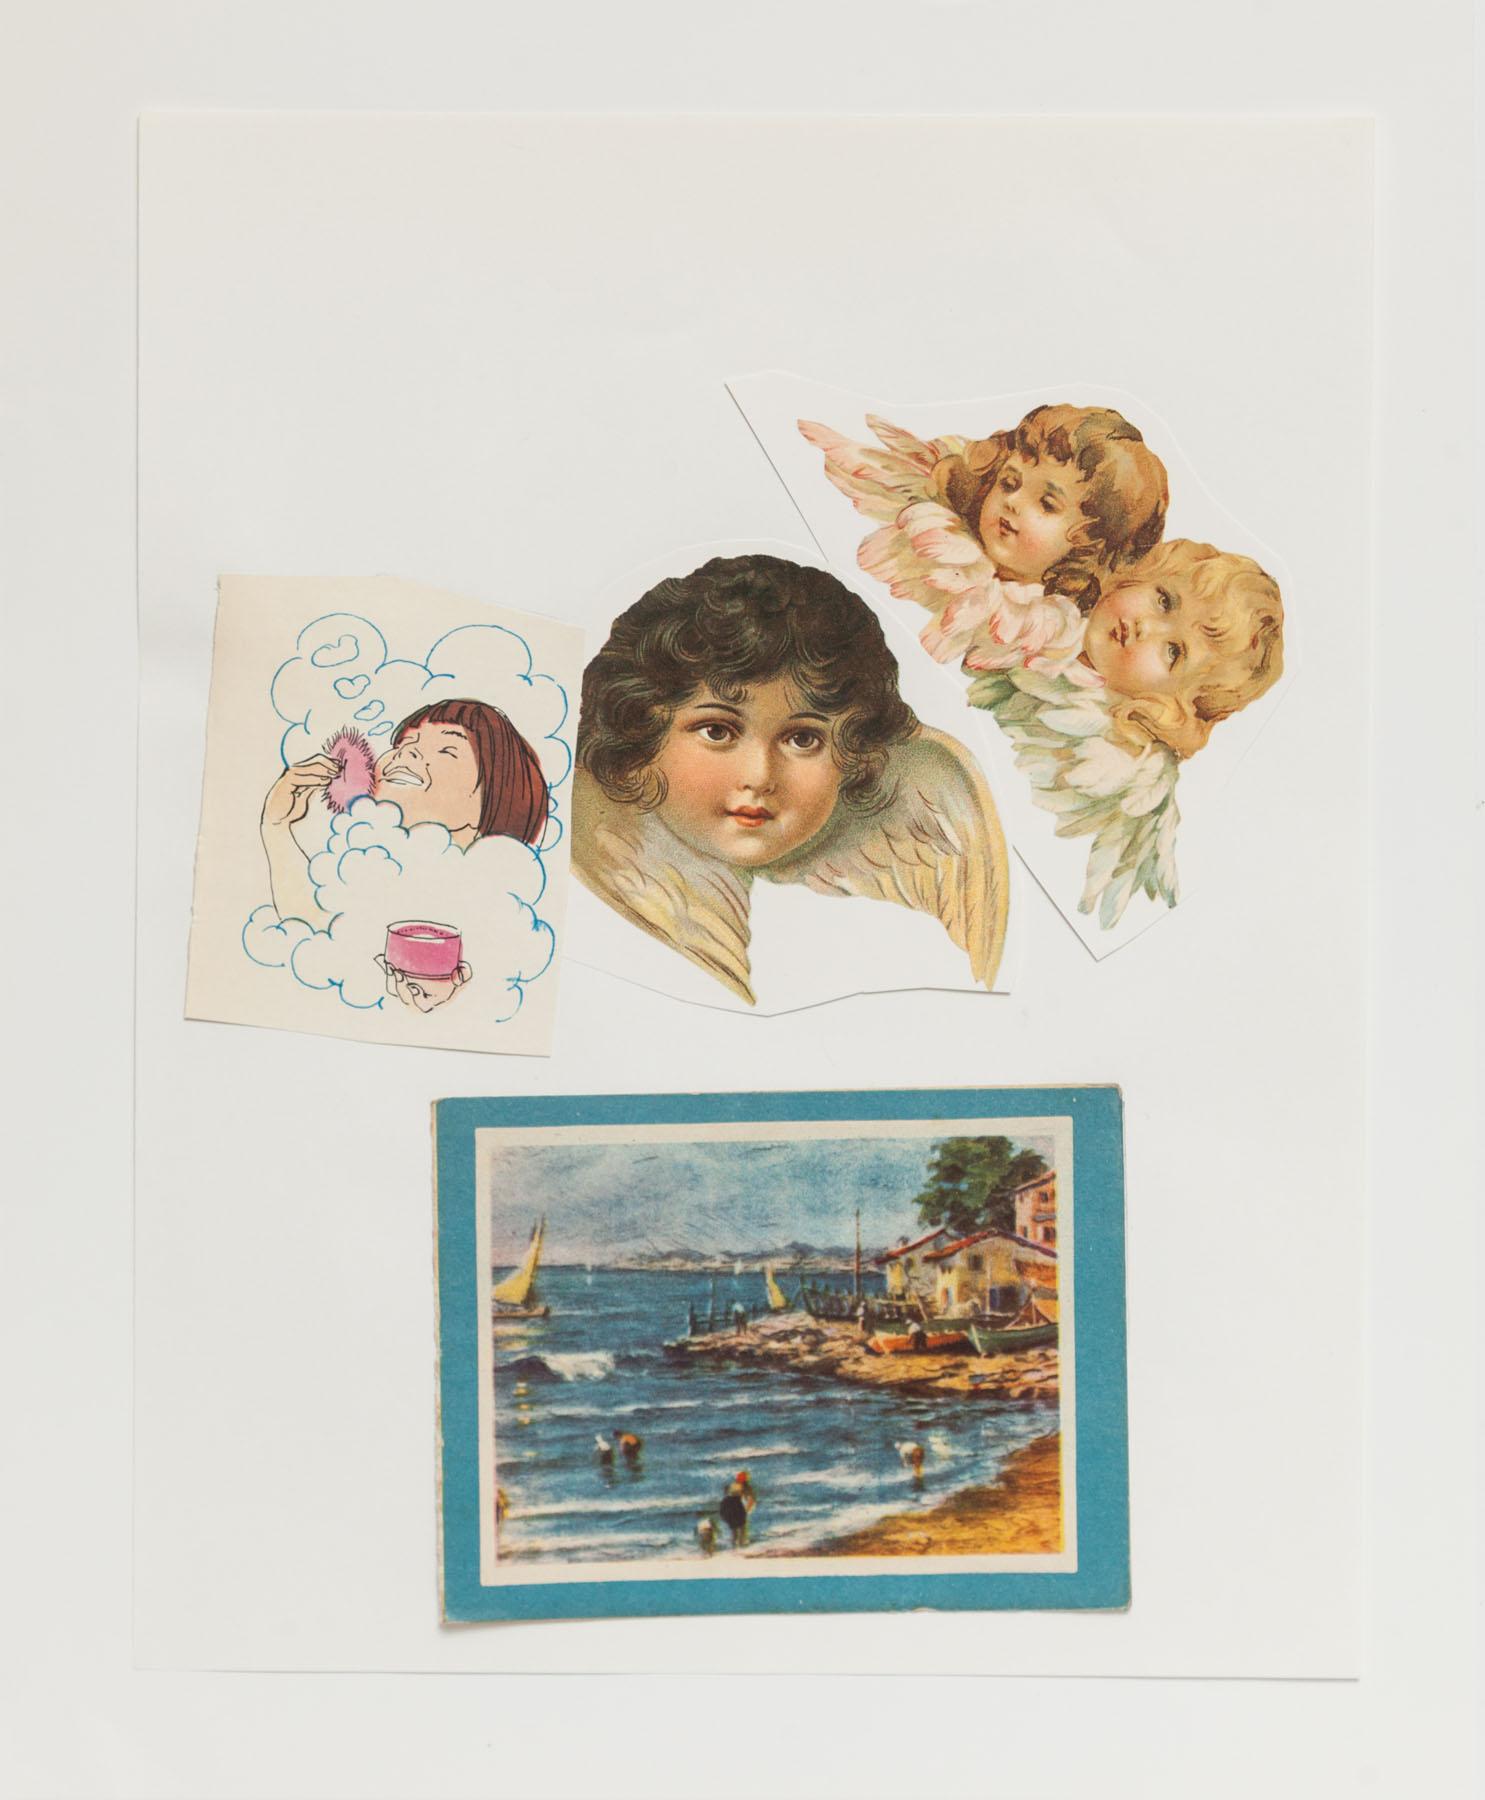 Serie Cuarentena, papel collage, 32,5 cm x 26,5 cm, 2020